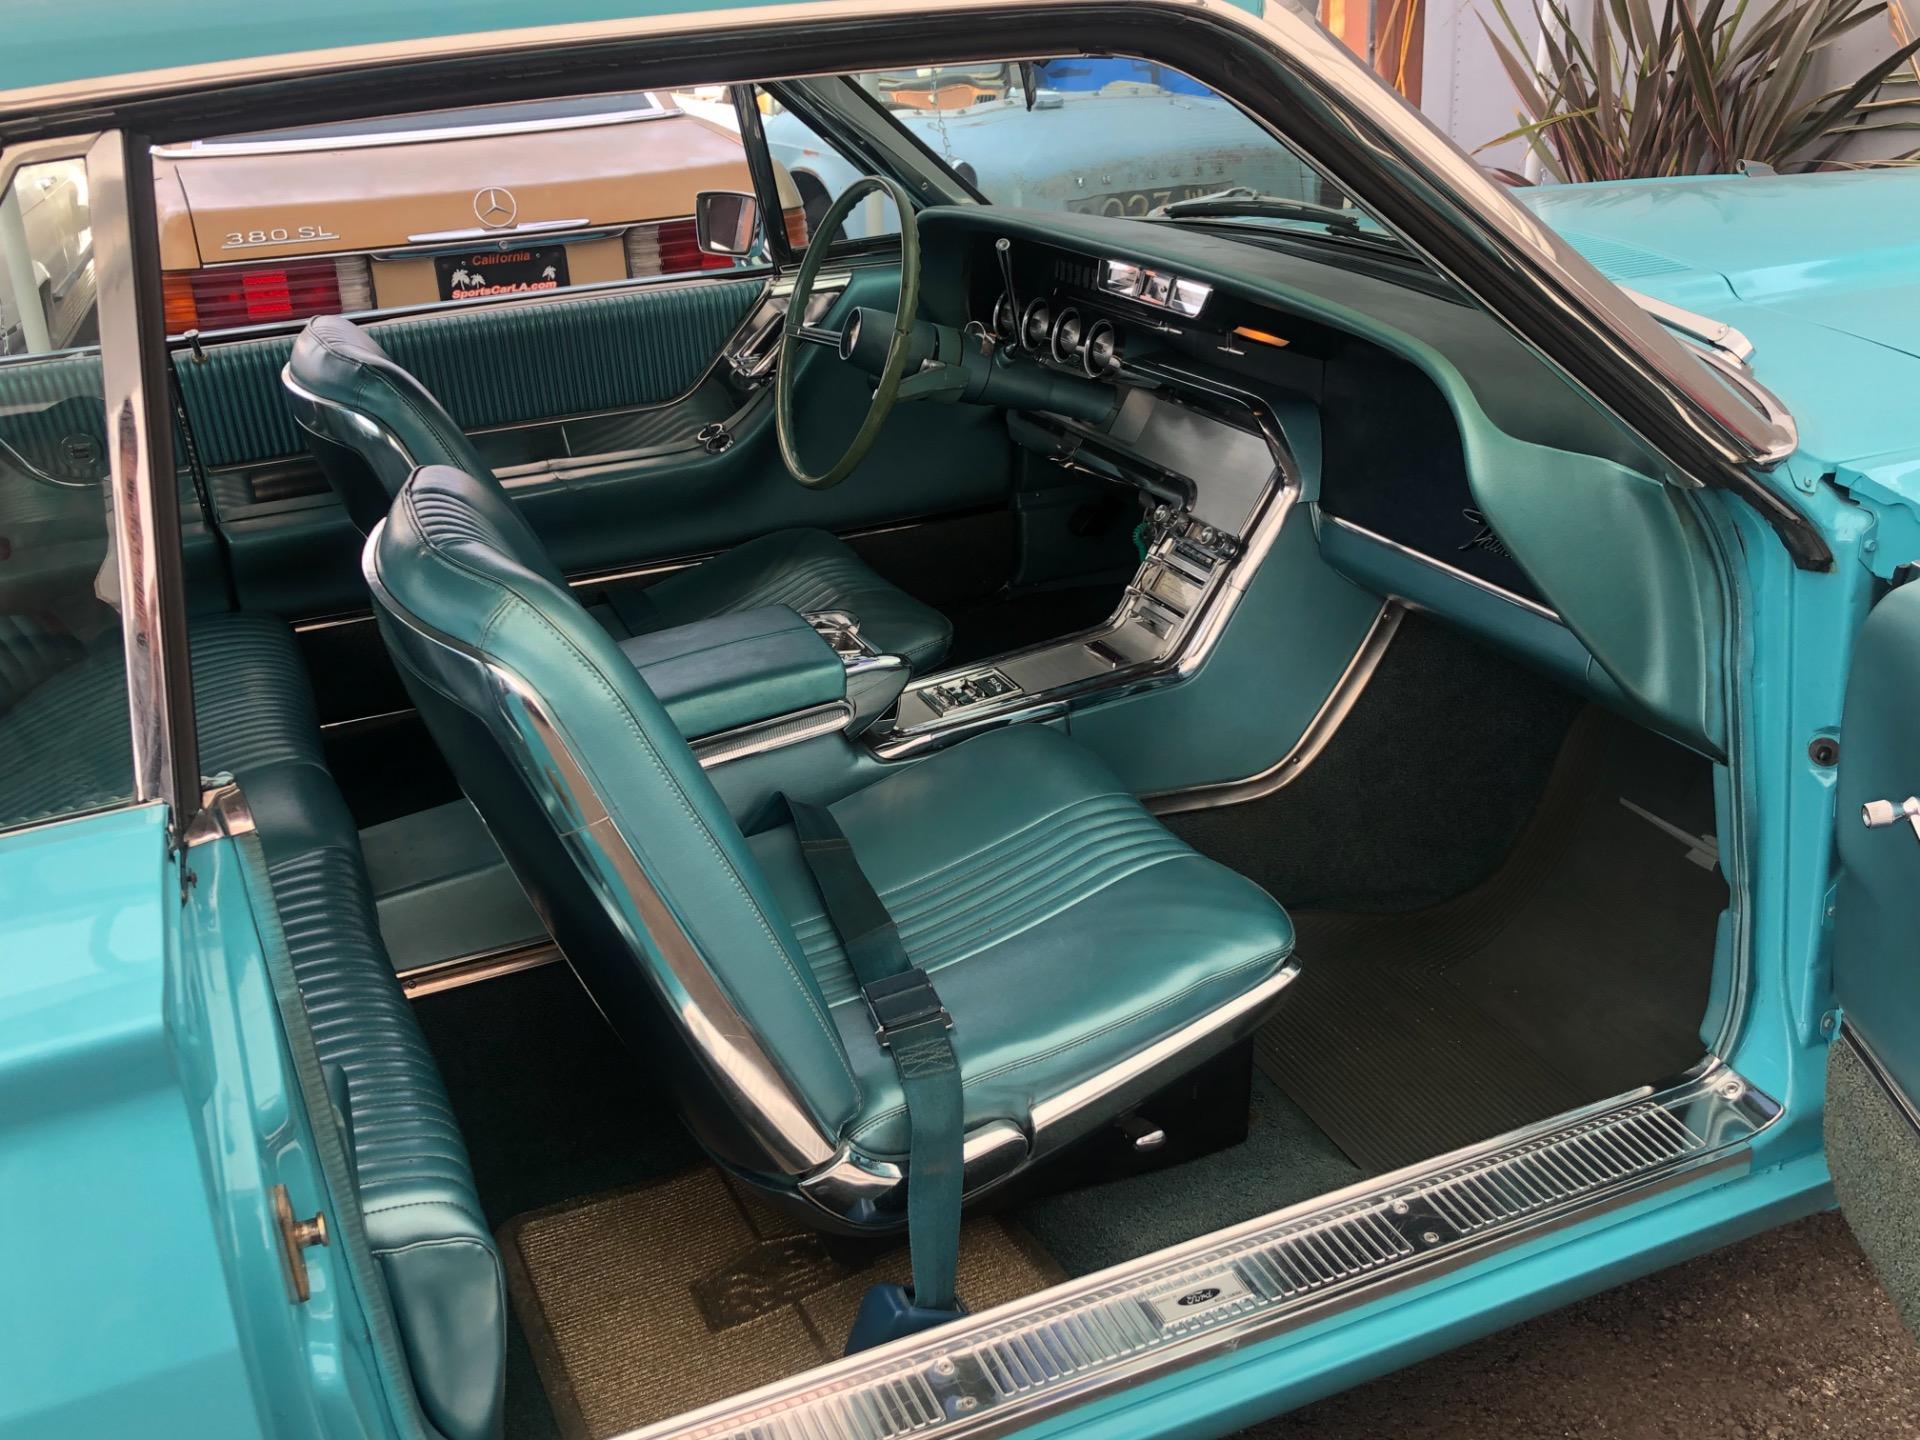 Used 1964 FORD Thunderbird